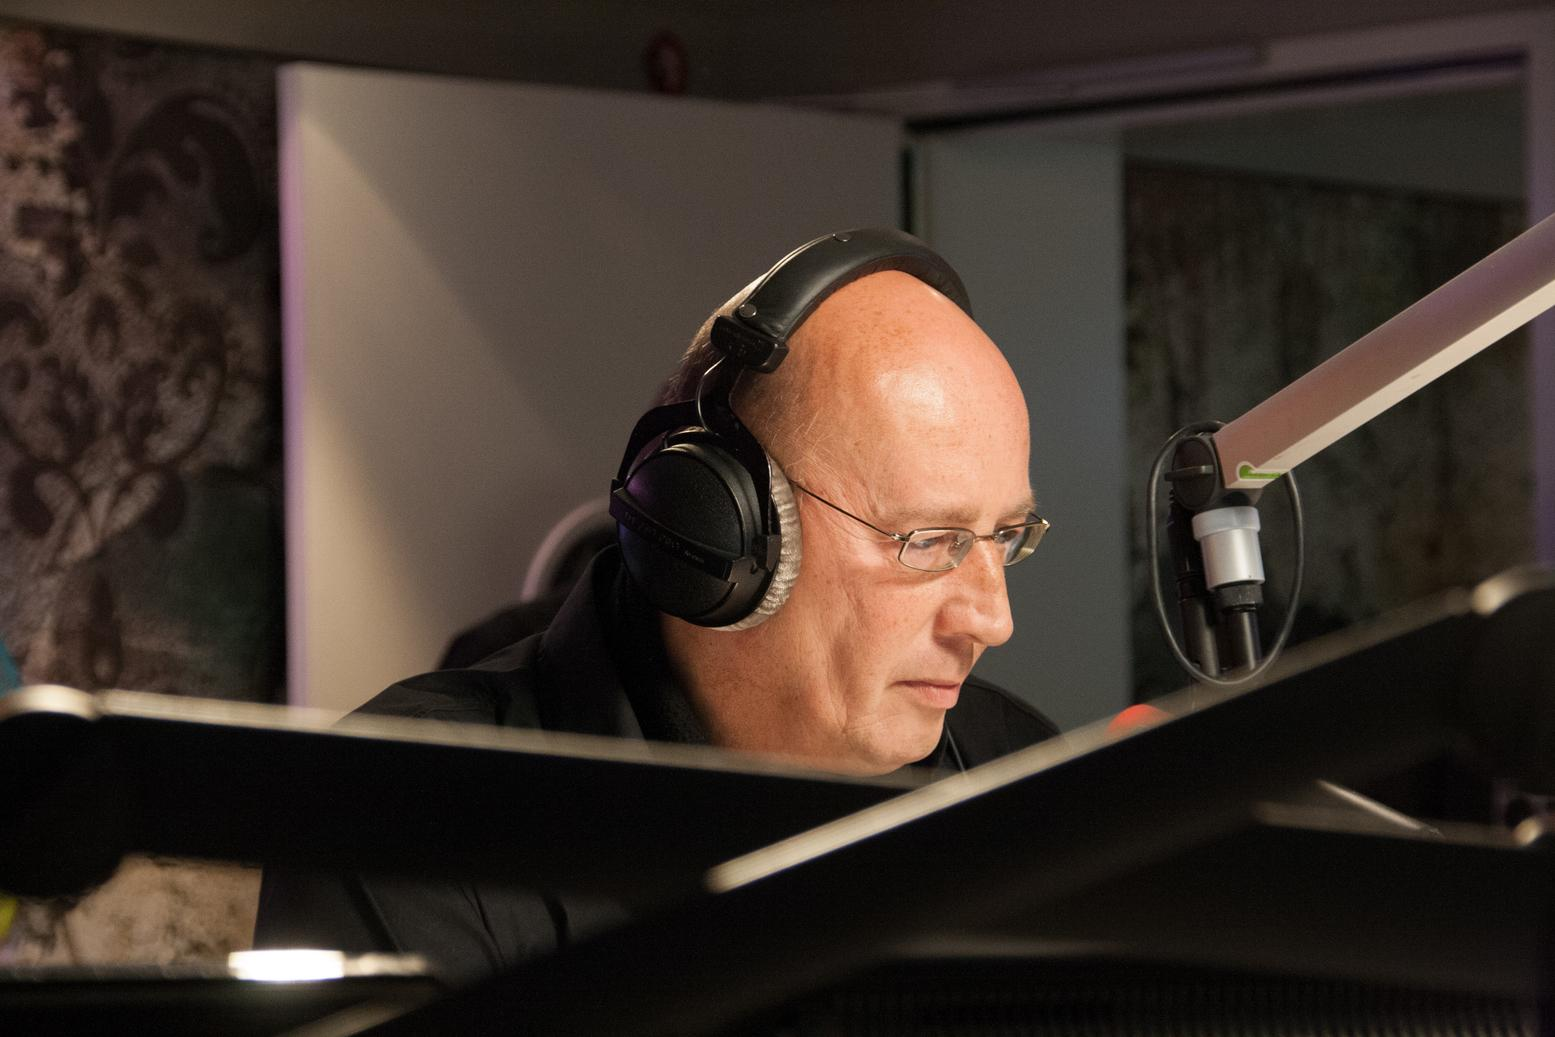 2013-11-30-3FM-MegaTop50-614.jpg